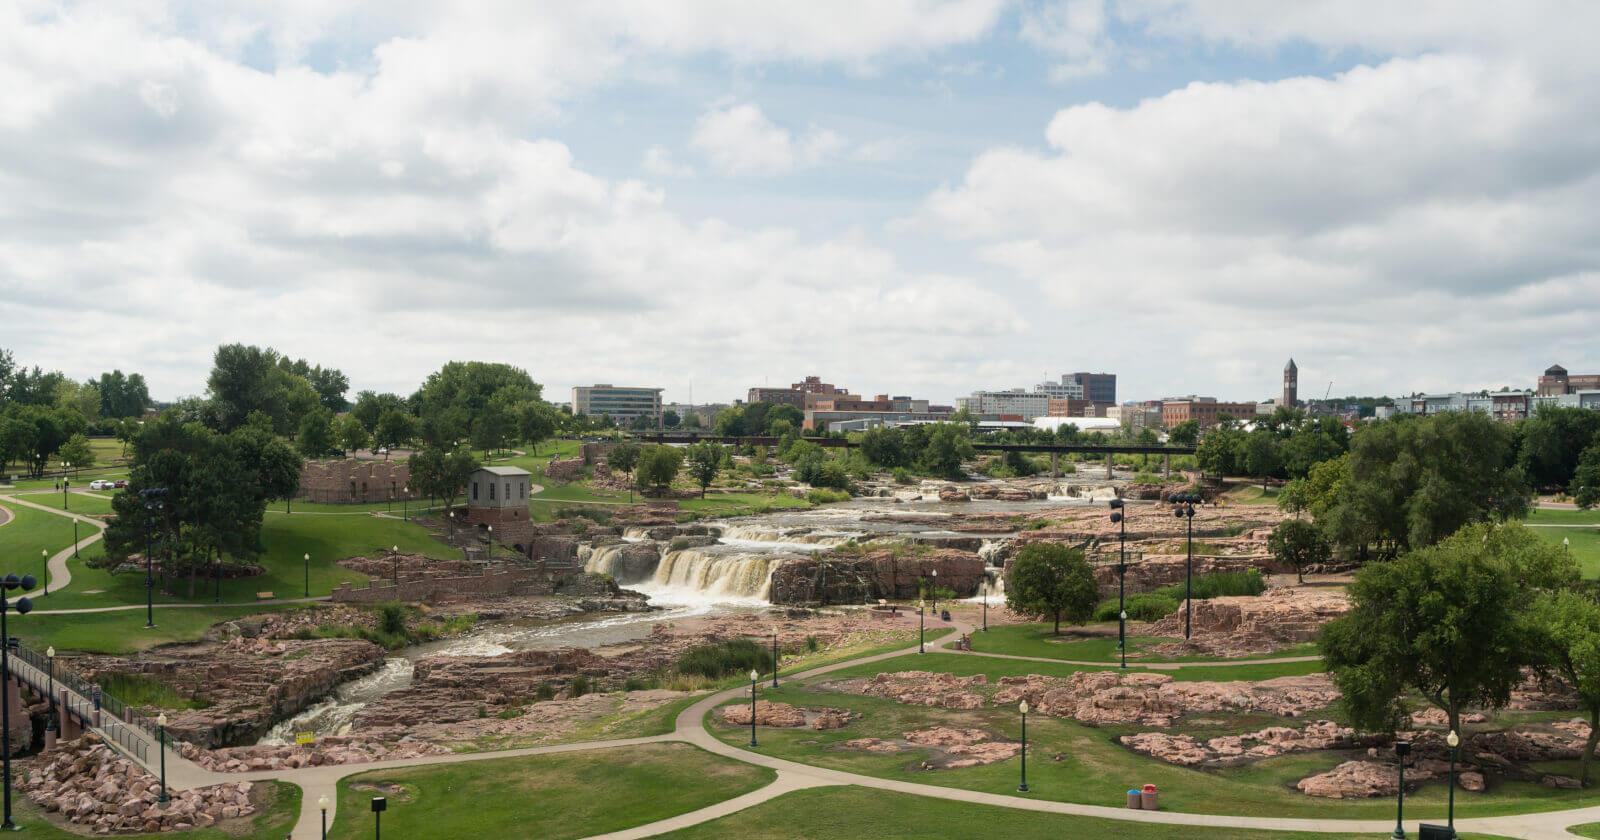 Thumbnail of Sioux Falls